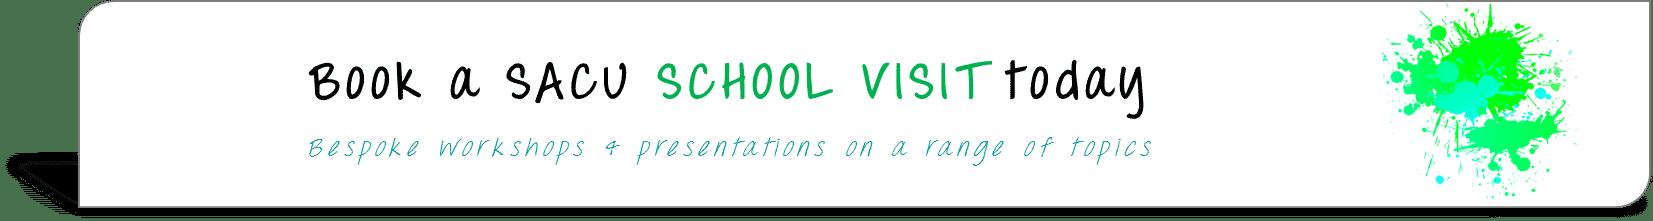 slider_school_visit